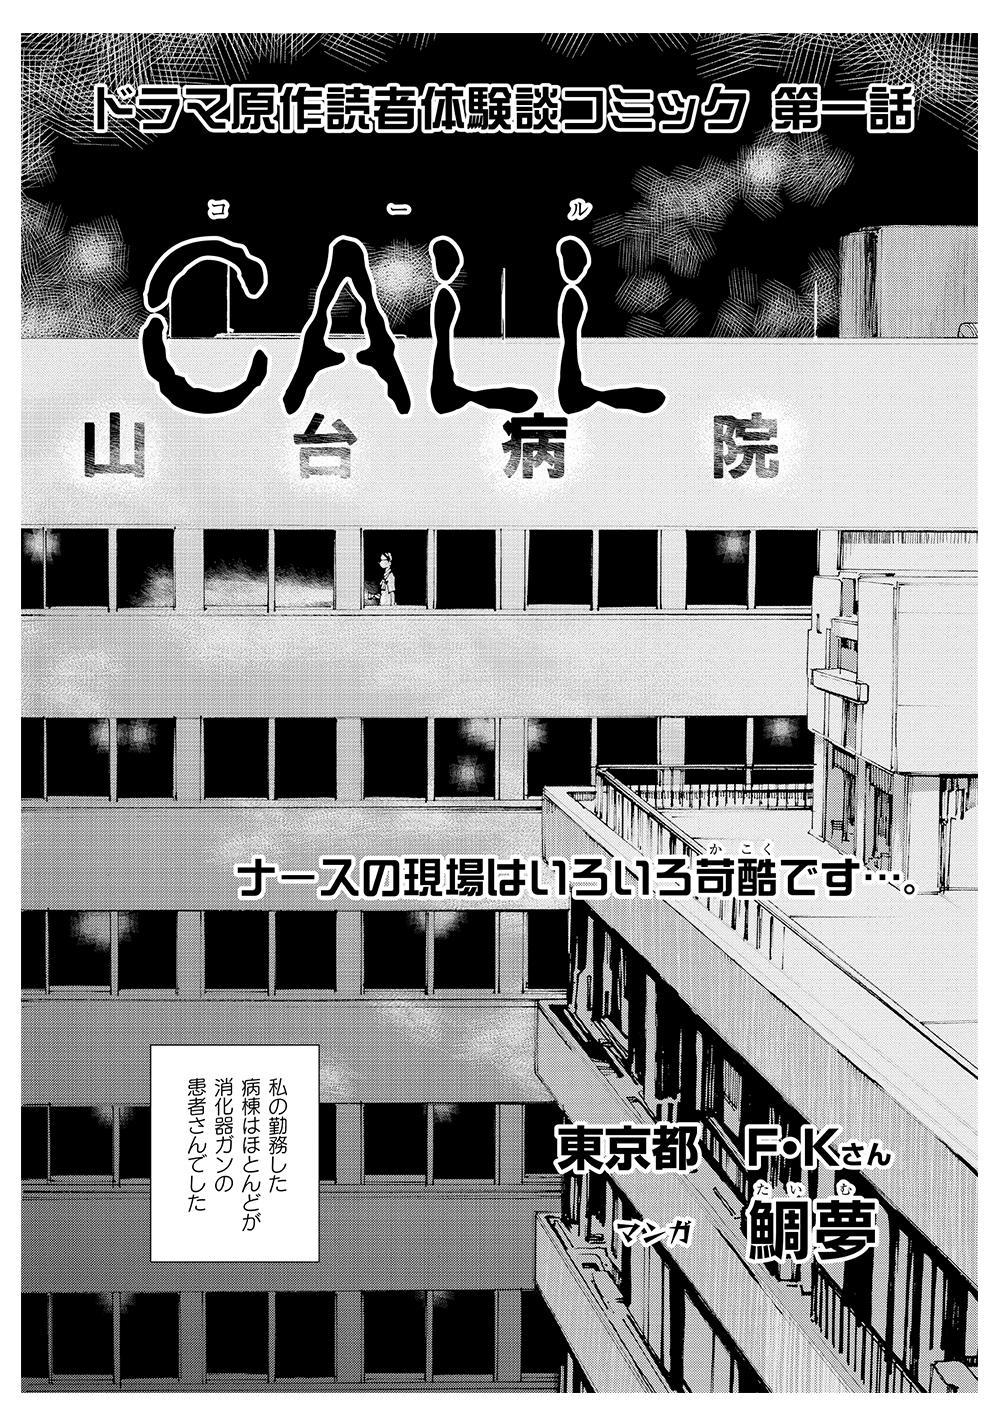 call02.jpg